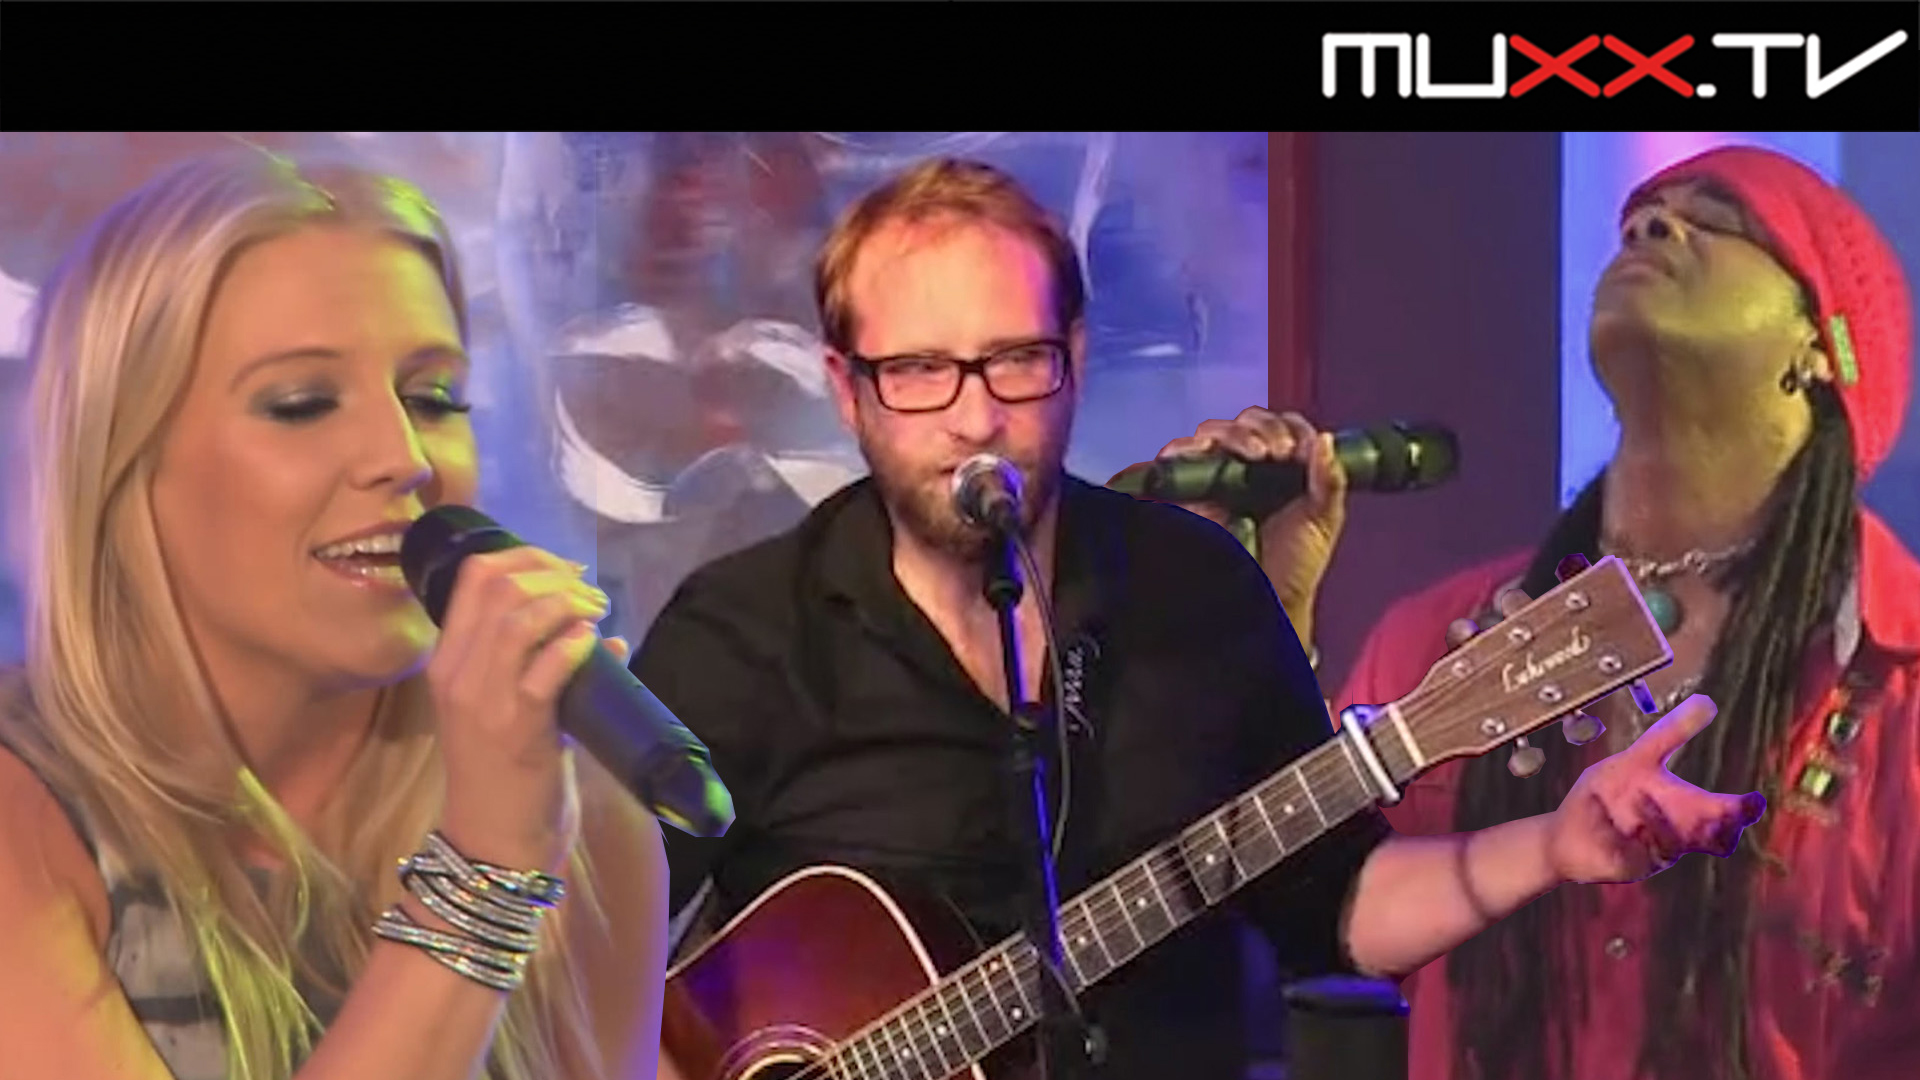 MUXXtv Der Live TV Sender Im Internet SONG OF MY LIFE